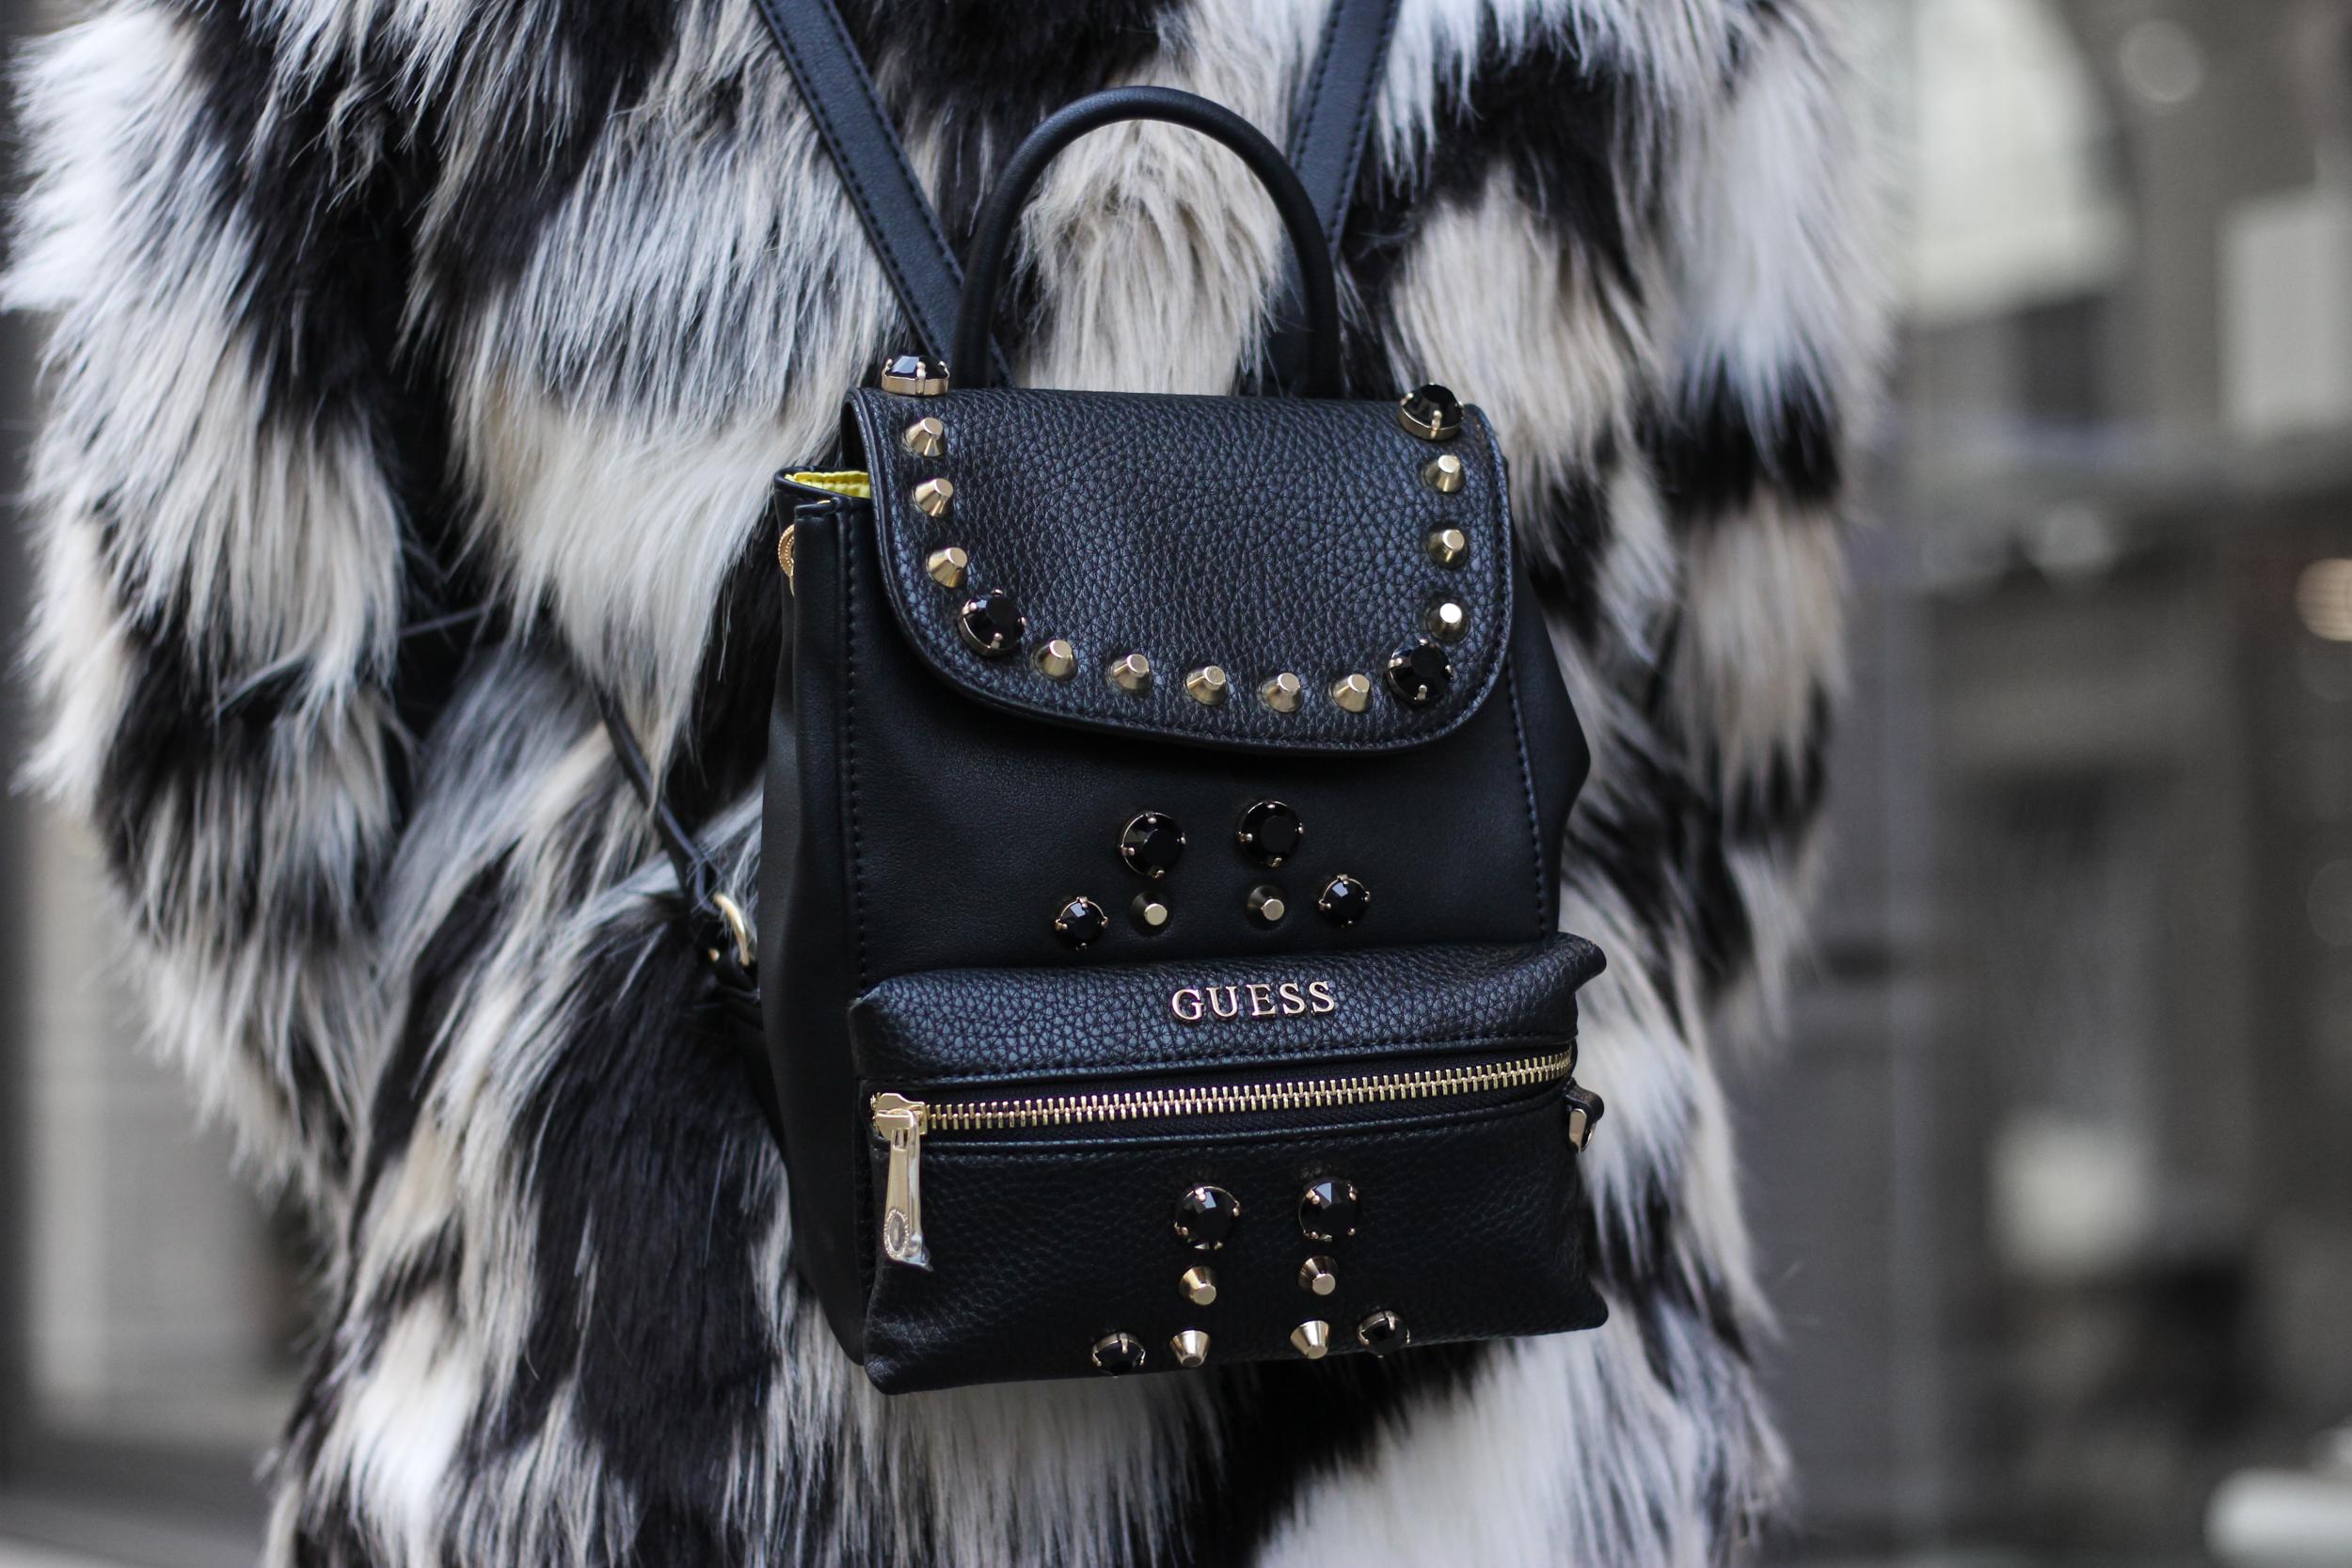 franziska-elea-blogger-aus-muenchen-fake-fur-jacke-netzstrumpfhose-overknee-stiefel-guess-lederrucksack-minirucksack-handtasche-backpack-nieten